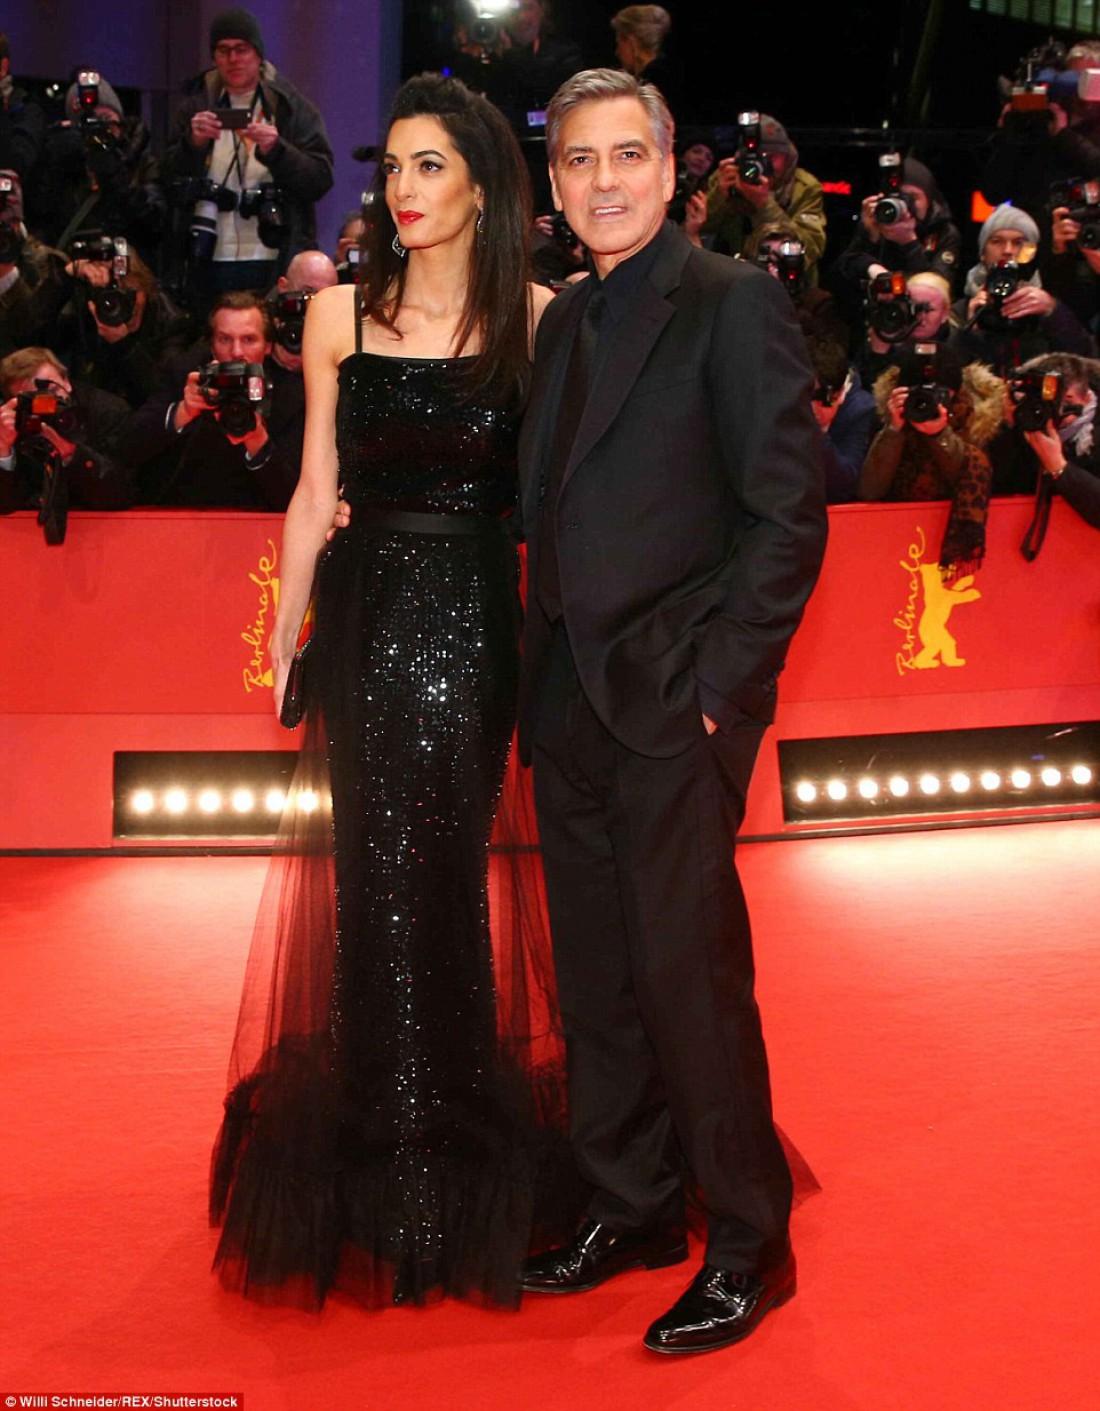 Джордж Клуни и Амаль Алламудин посетили открытие Берлинского кинофестиваля 2016